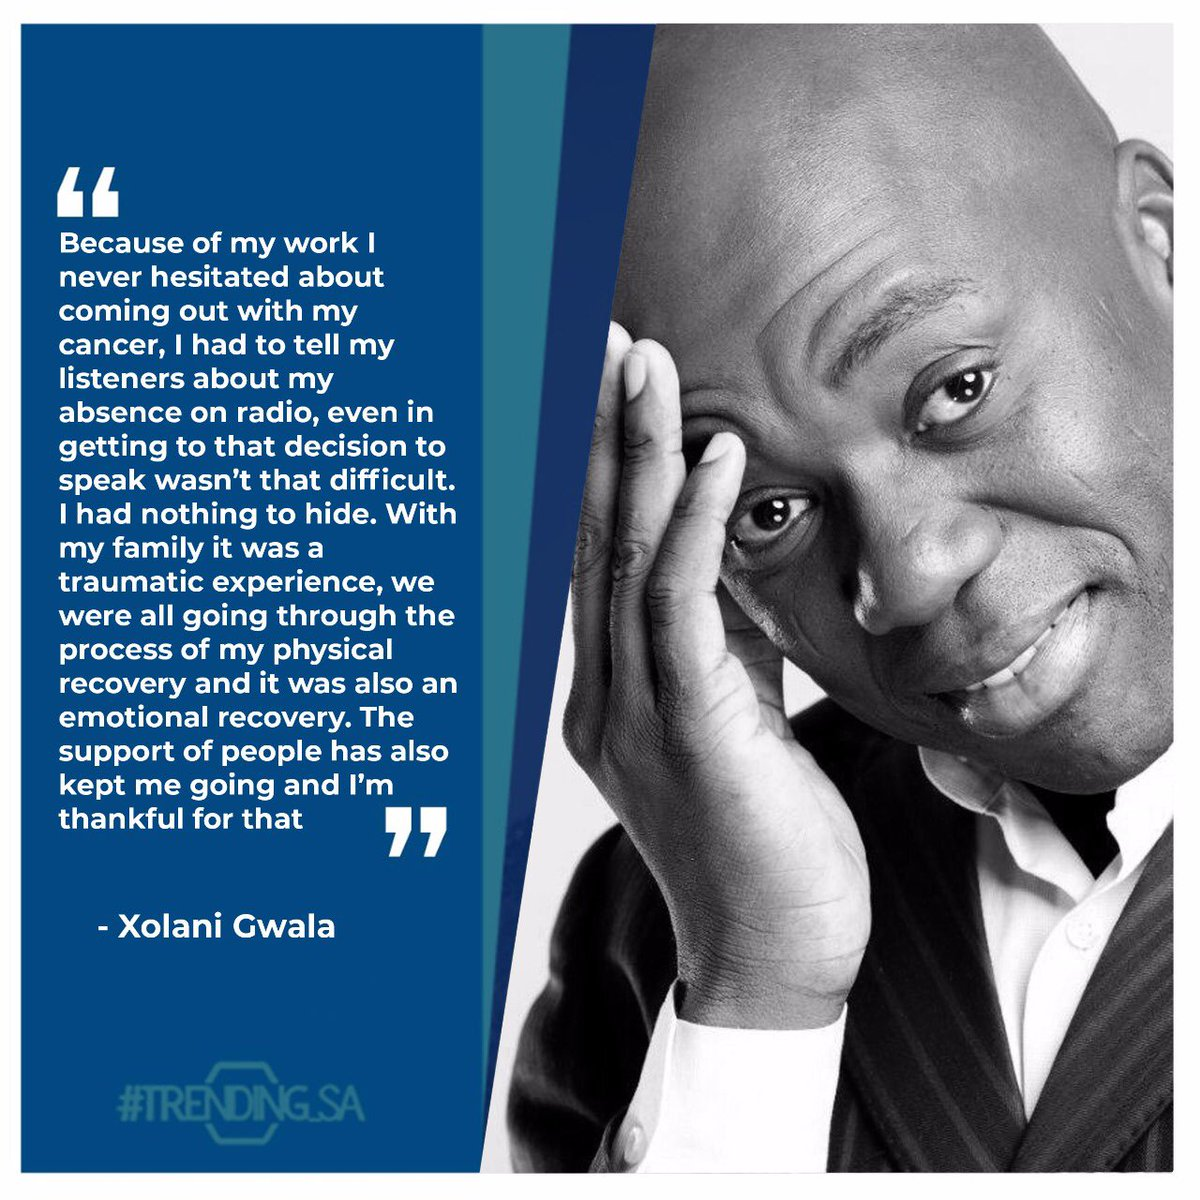 Current Affairs TV and Radio Presenter Xolani Gwala on his survival with cancer. #tsaonline #tsaon3